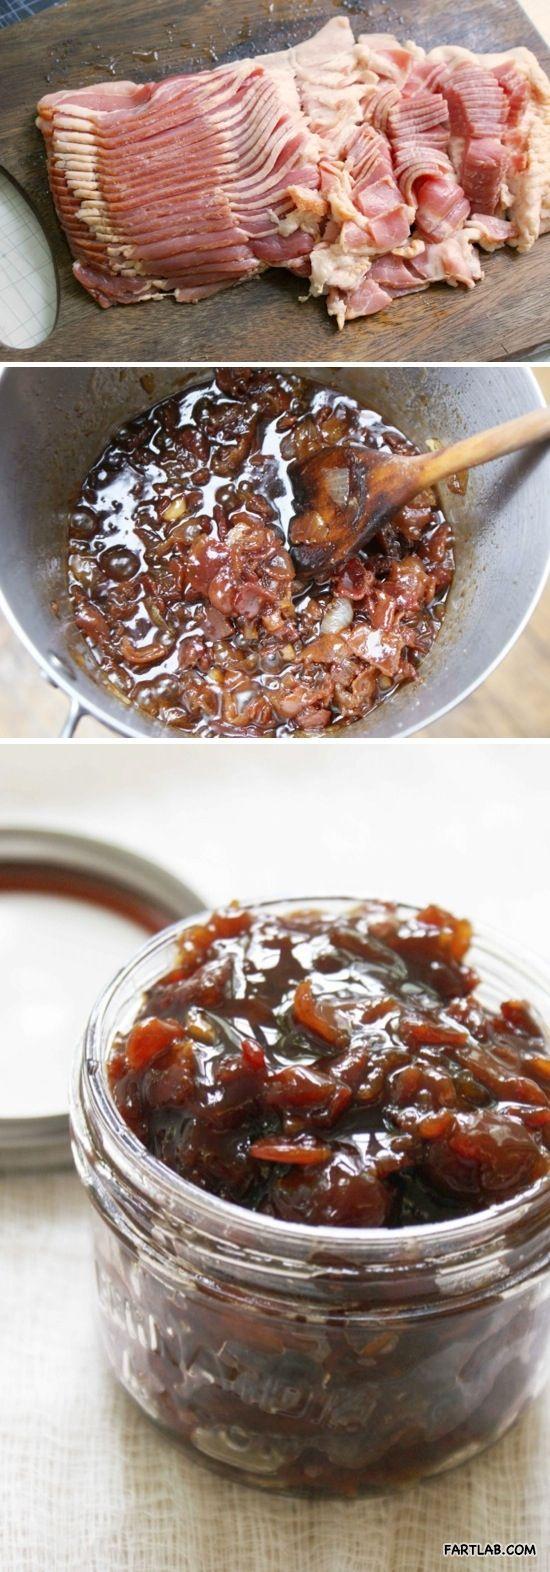 Bacon Jam | Recipe Mania | Pinterest